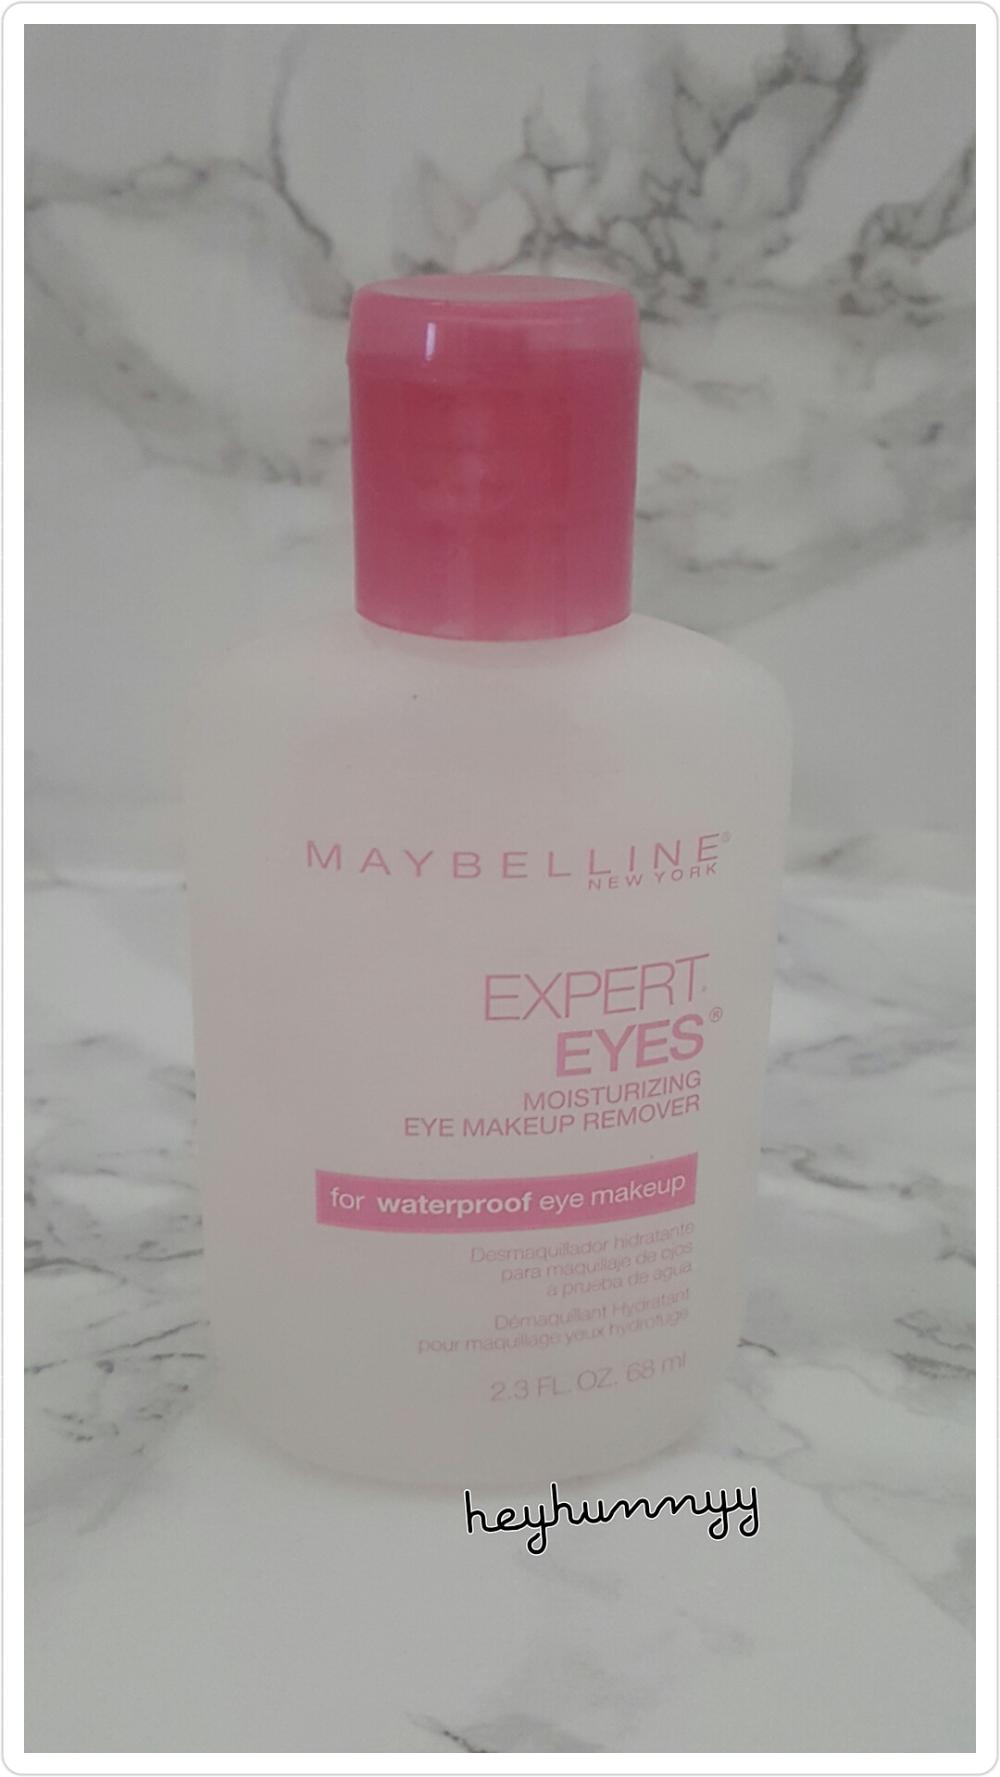 REVIEW Maybelline Expert Eyes Moisturizing Eye Makeup